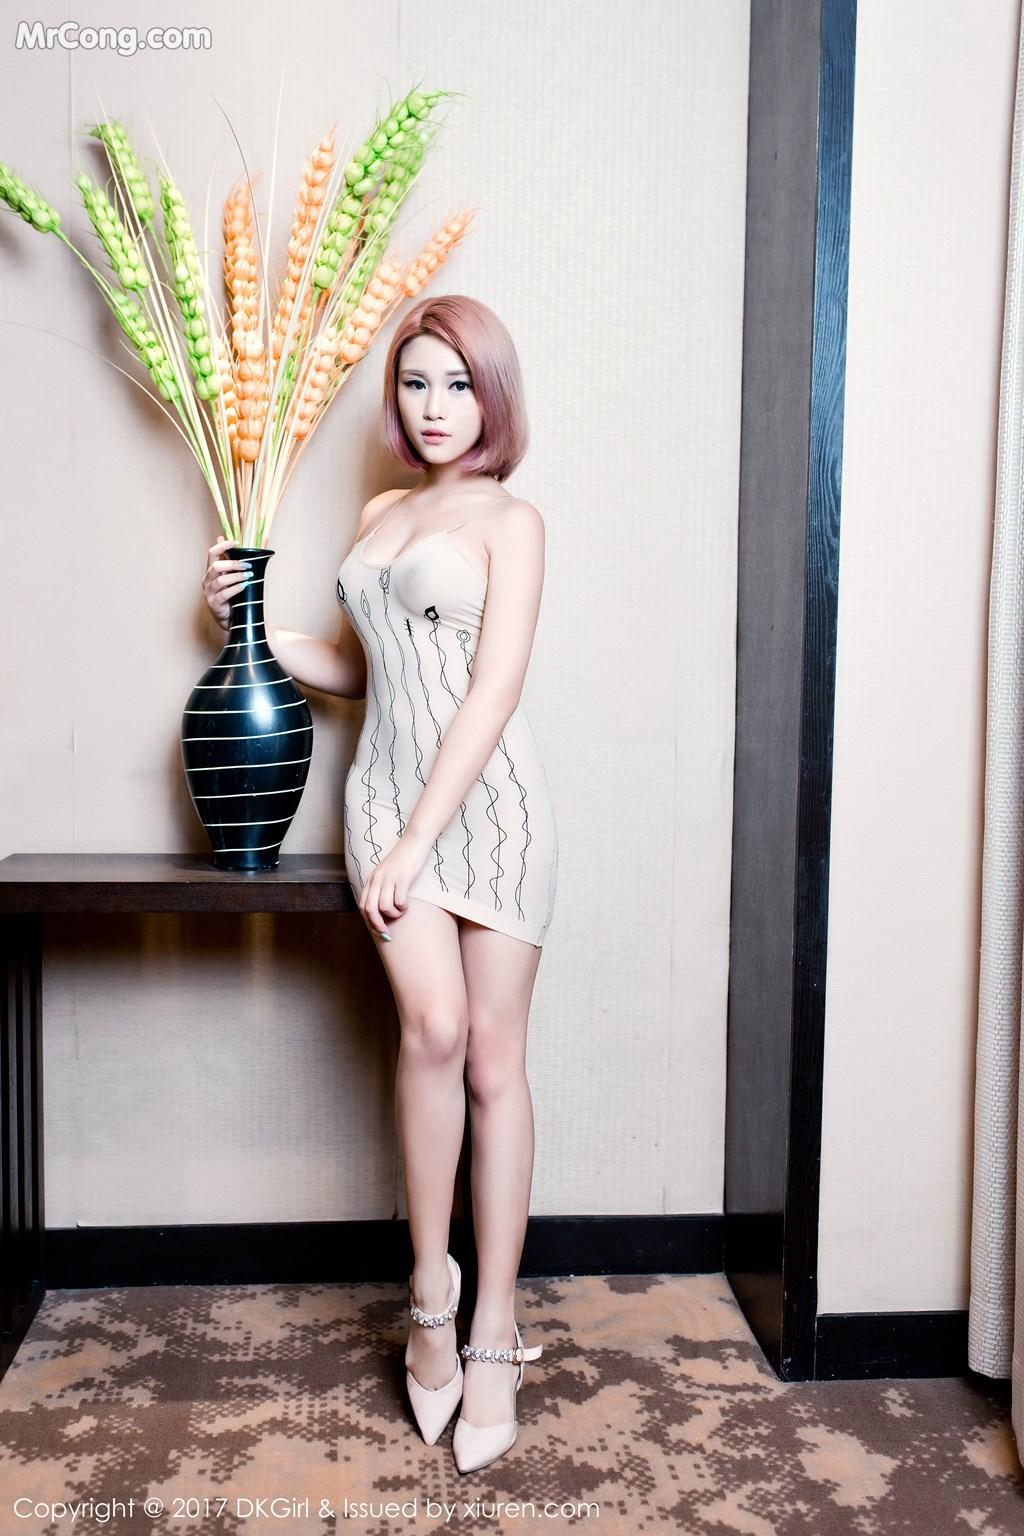 Image DKGirl-Vol.045-Meng-Bao-Er-BoA-MrCong.com-025 in post DKGirl Vol.045: Người mẫu Meng Bao Er (萌宝儿BoA) (56 ảnh)